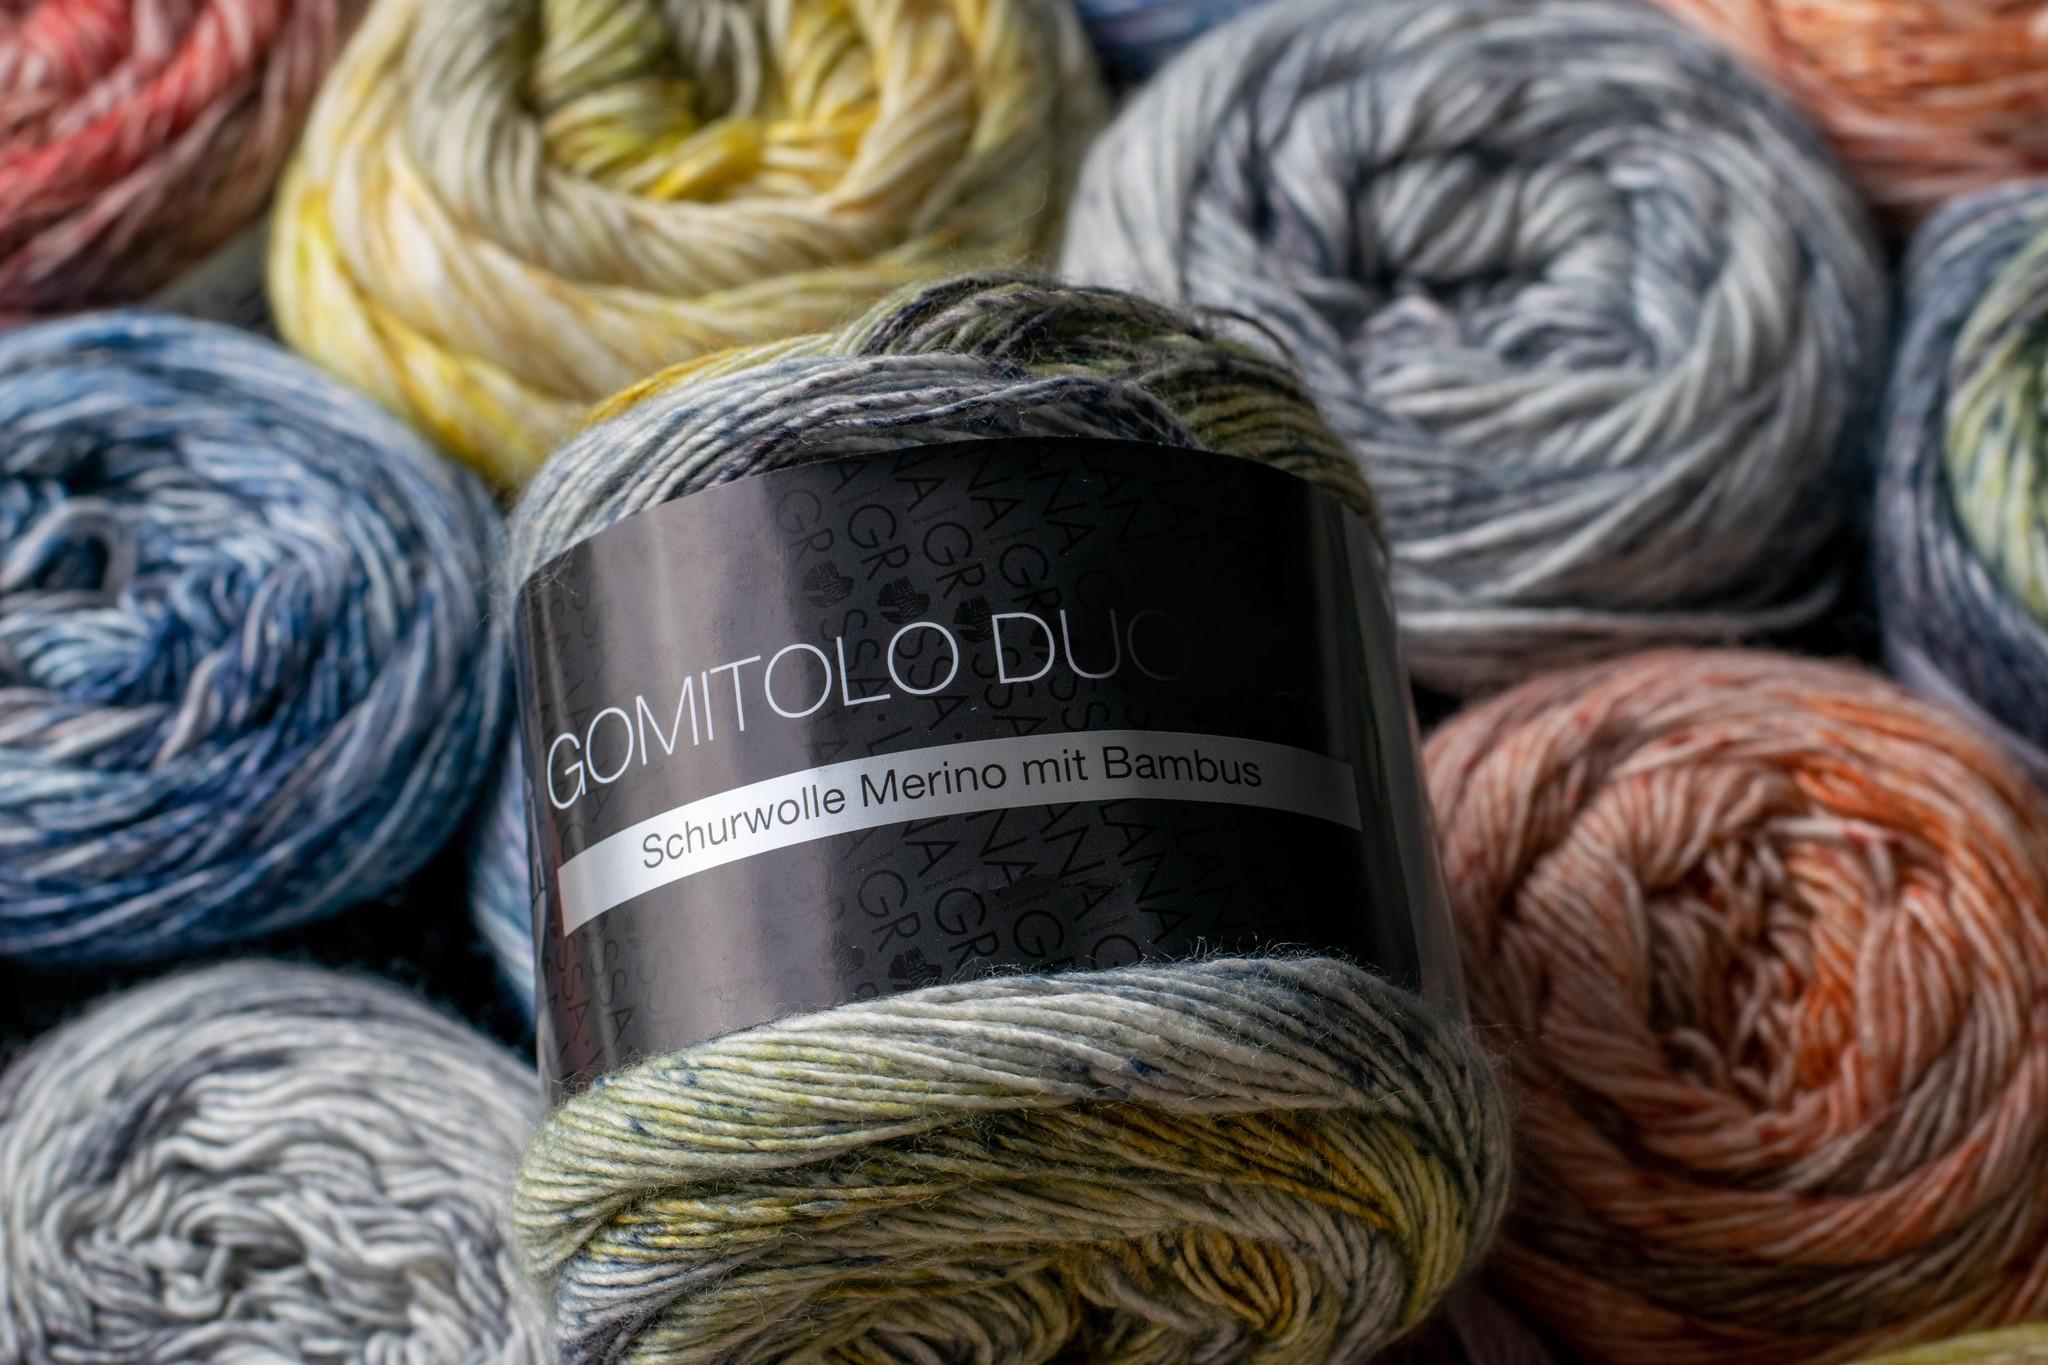 Lana Grossa: Gomitolo Duo 250 & 400